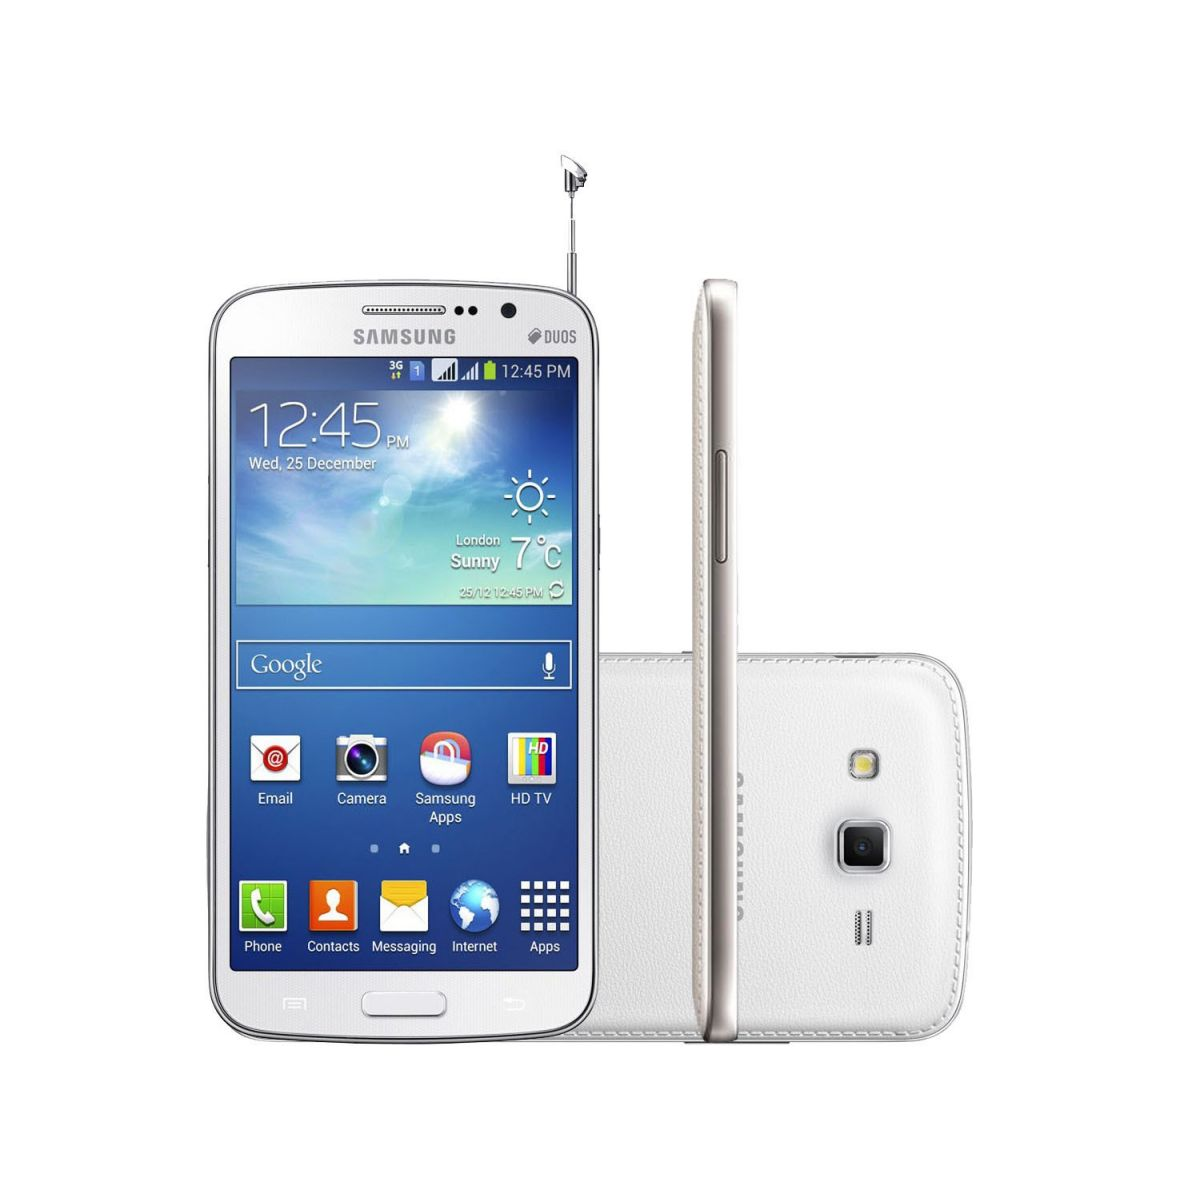 Smartphone Galaxy Gran Duos 2 TV G7102 - Android 4.3, 3G, Tela de 5,3, Cam 8MP, Quad Core 1.2 GHz, Dual Chip Branco